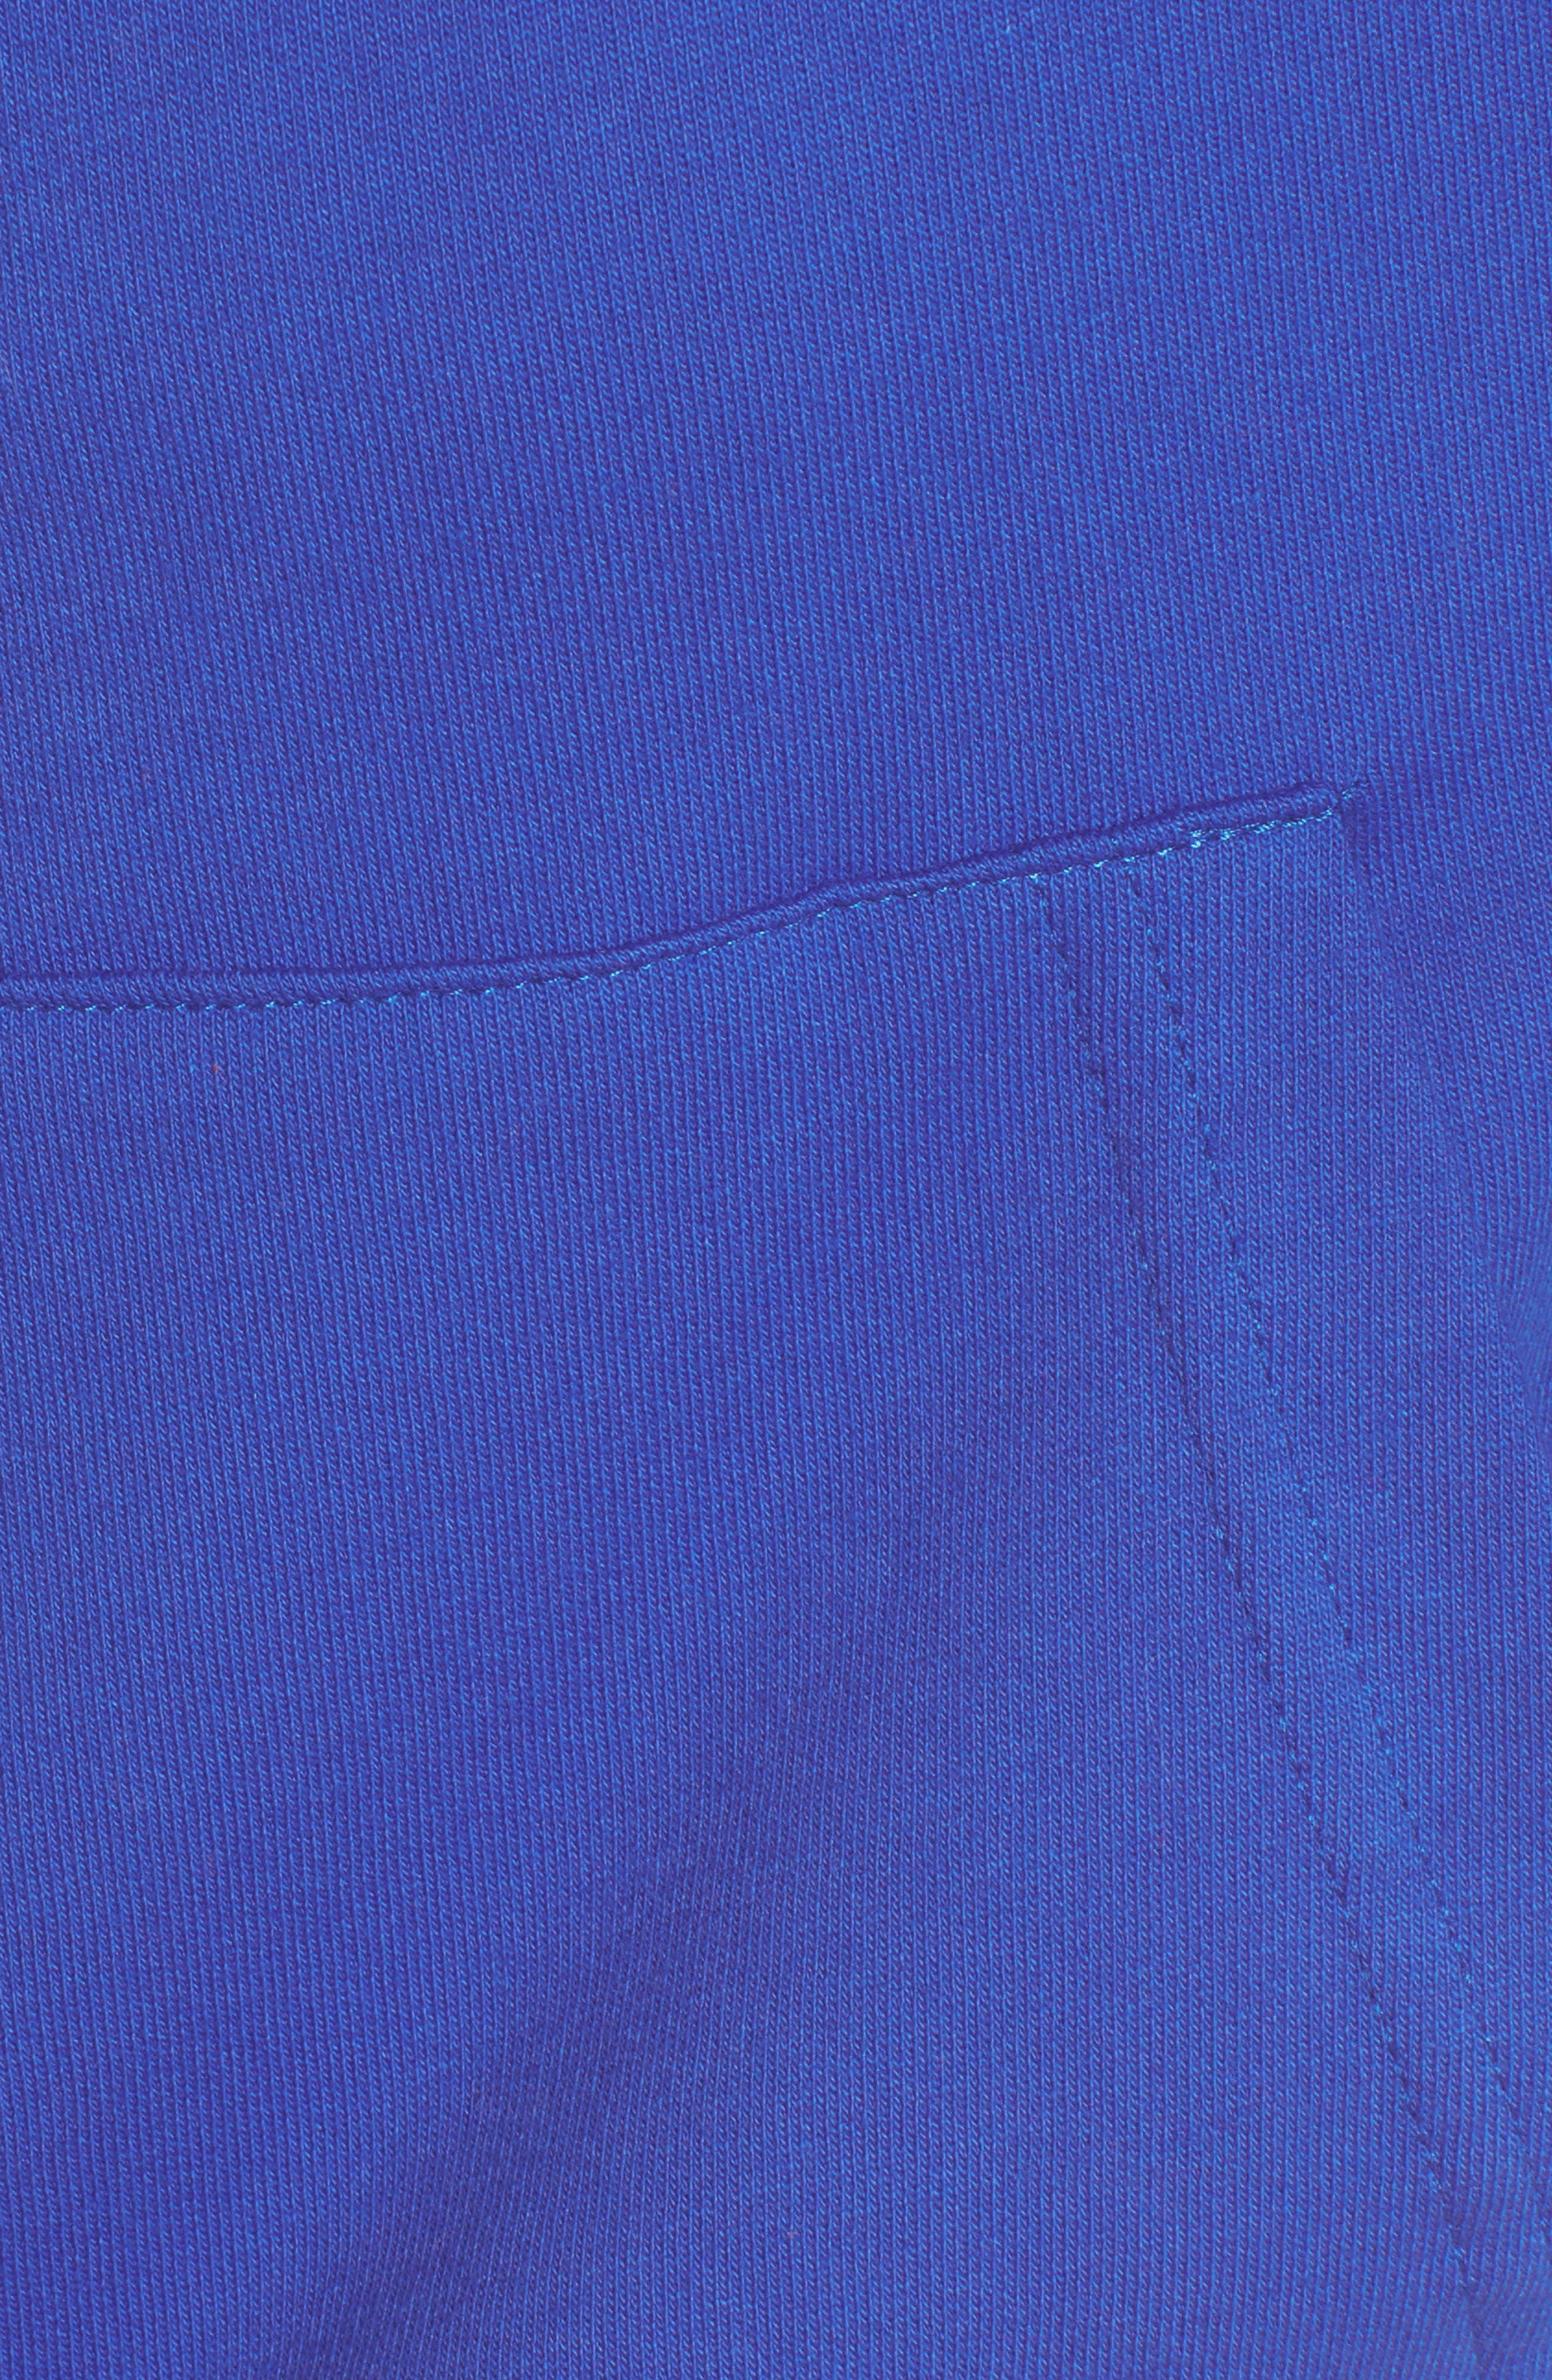 ME. Rose Pullover Hoodie,                             Alternate thumbnail 6, color,                             Royal Blue